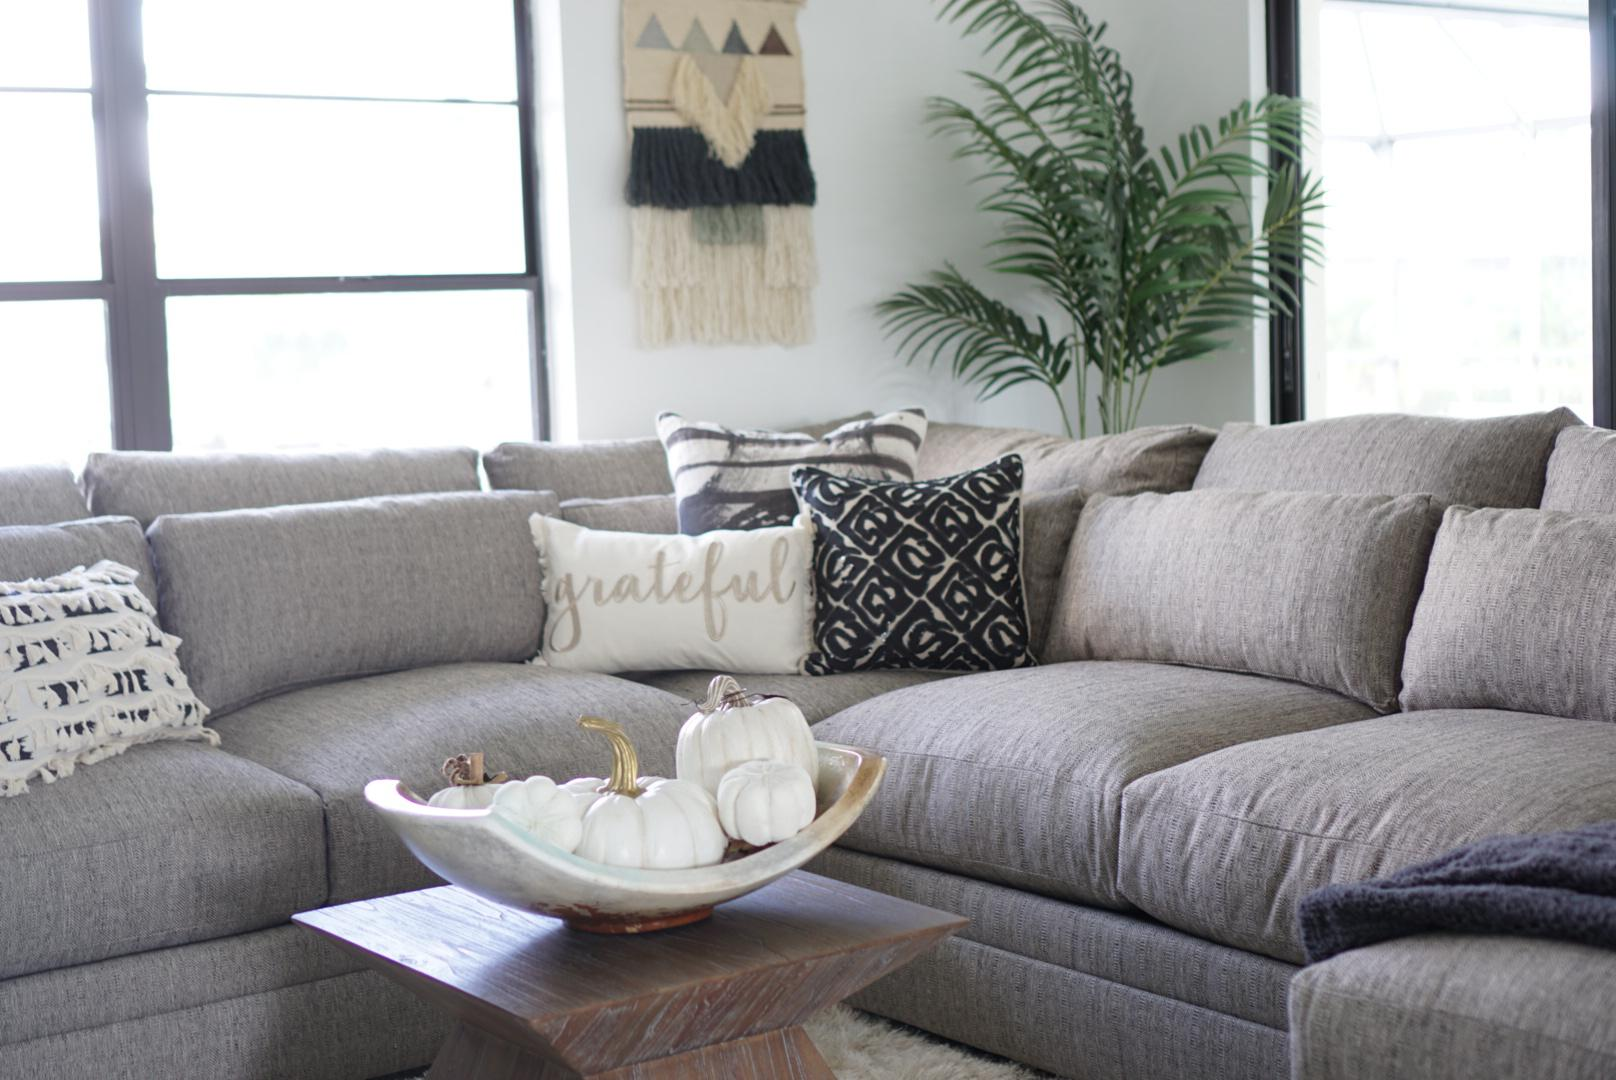 graceindesign style insider inspiration room makeover image 11